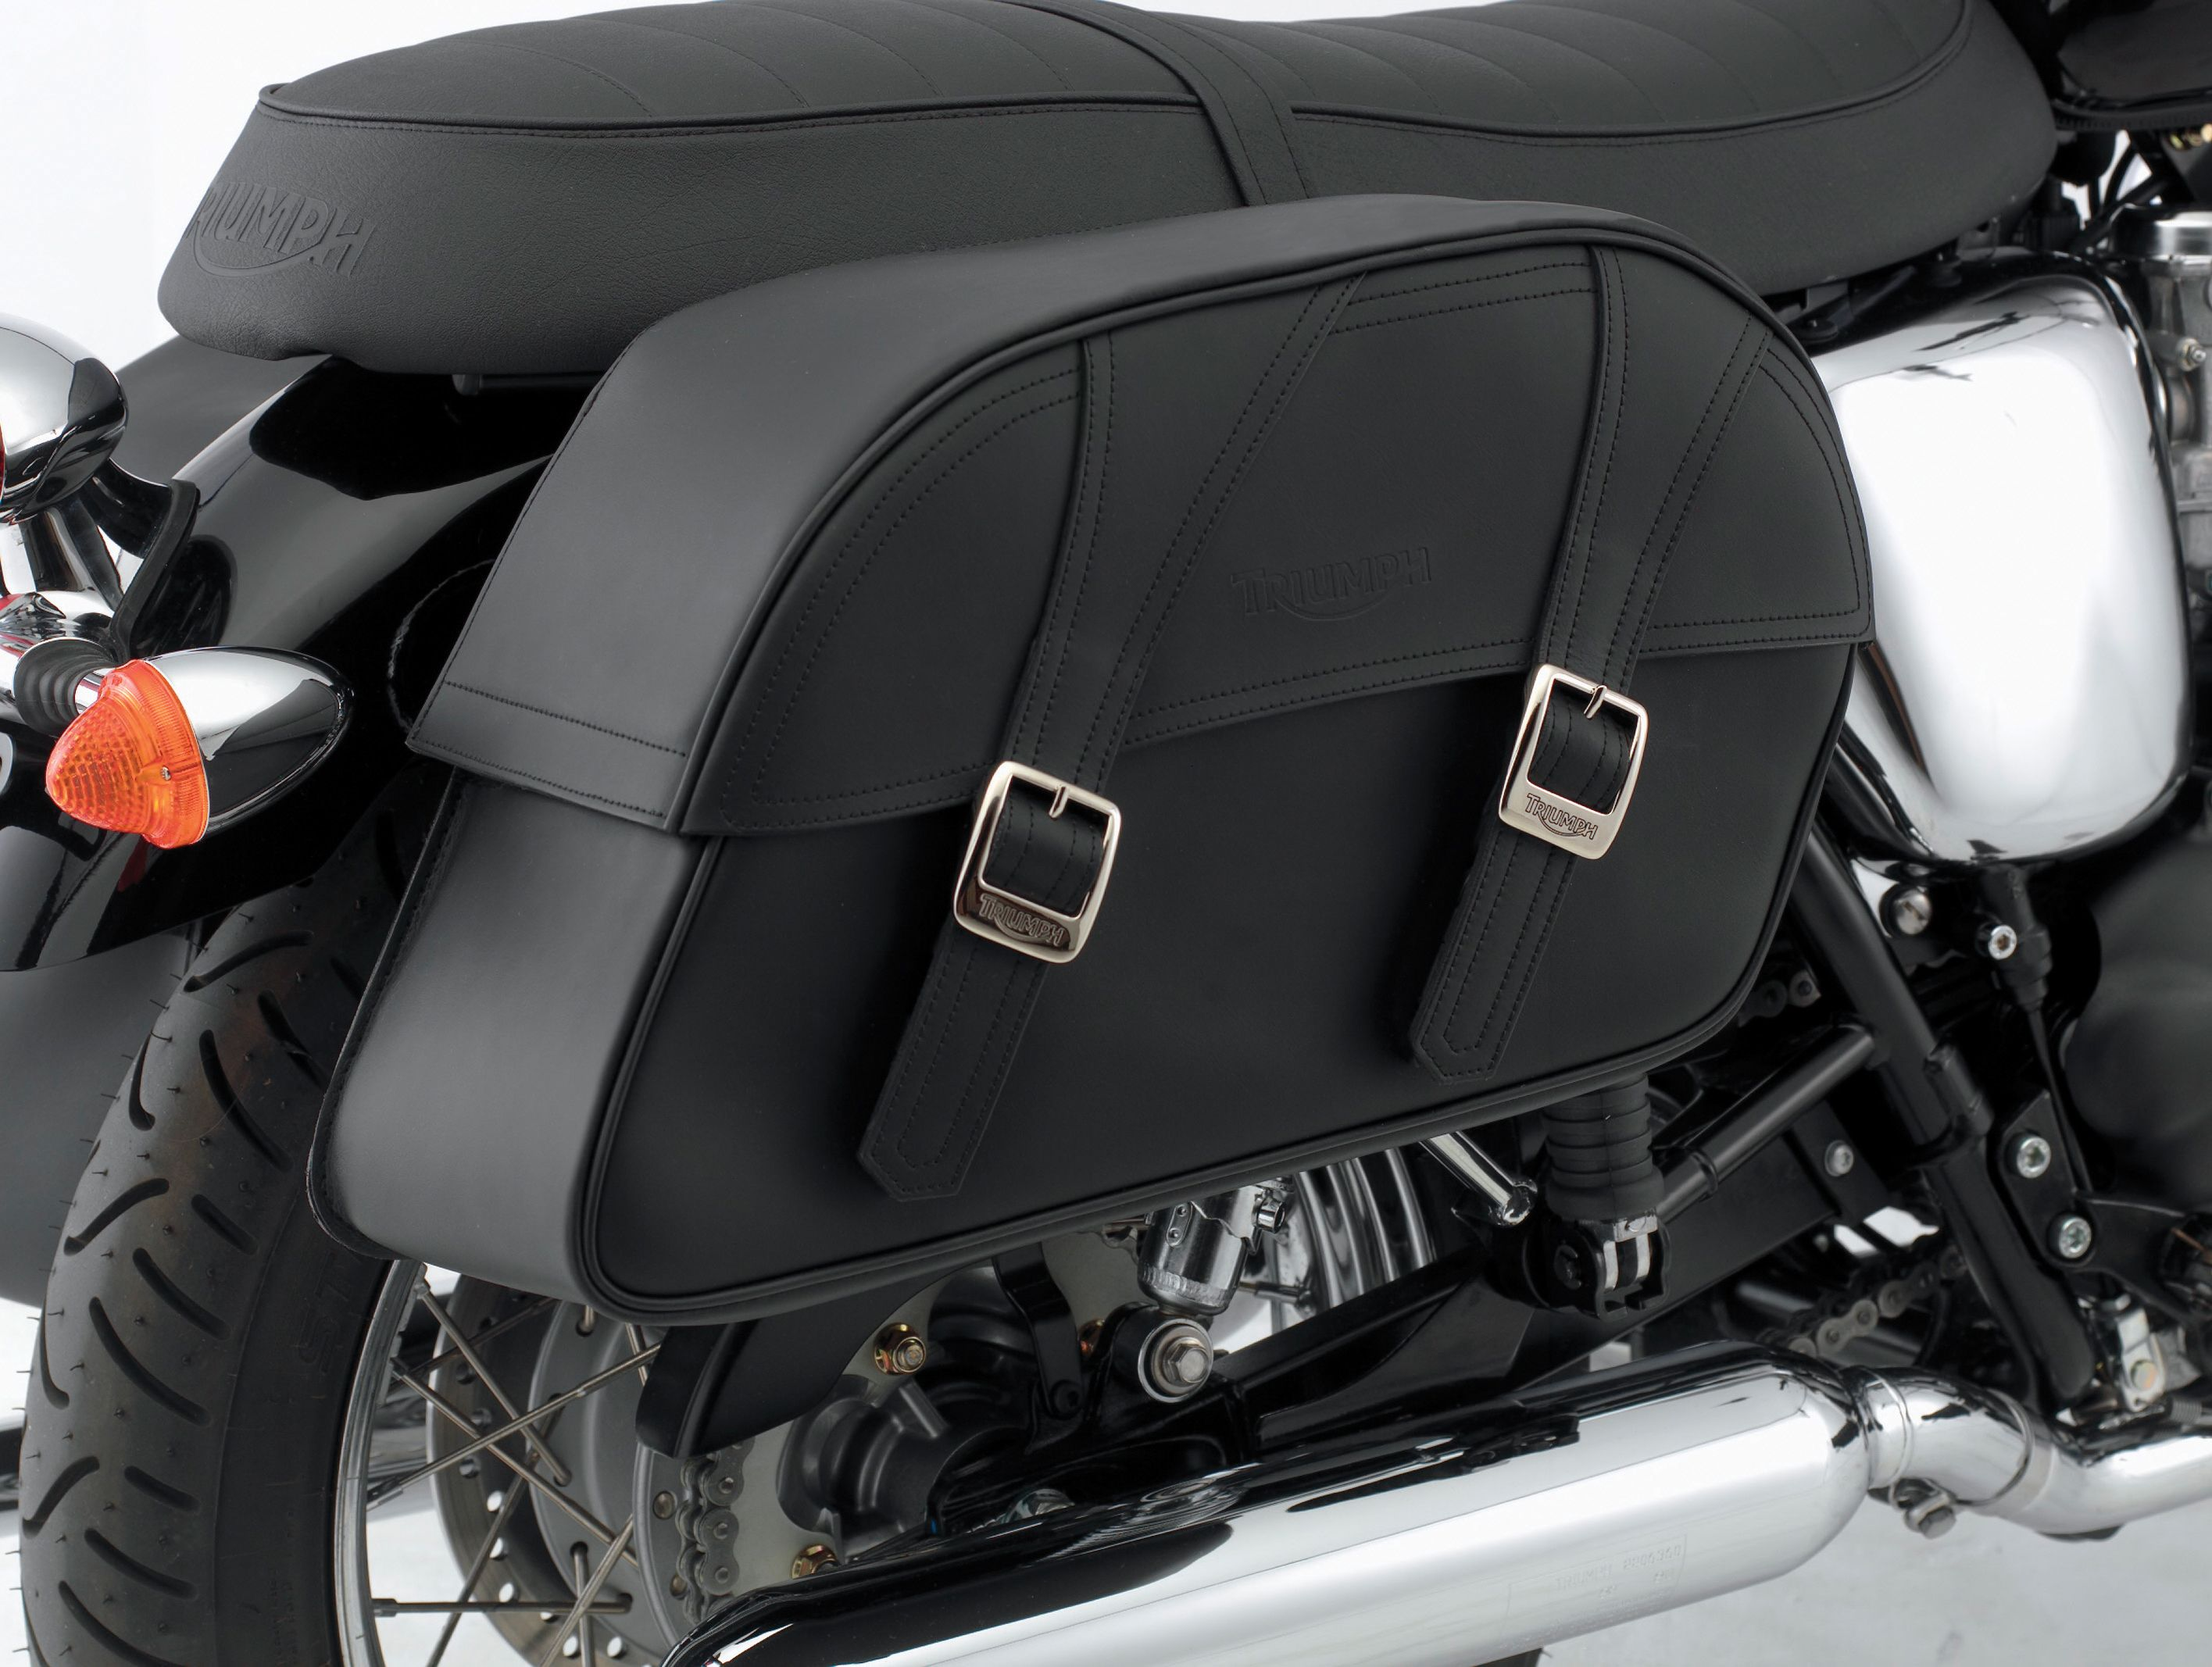 Triumph Bonneville Solo Seat Classic Leather Saddlebag Kit Large